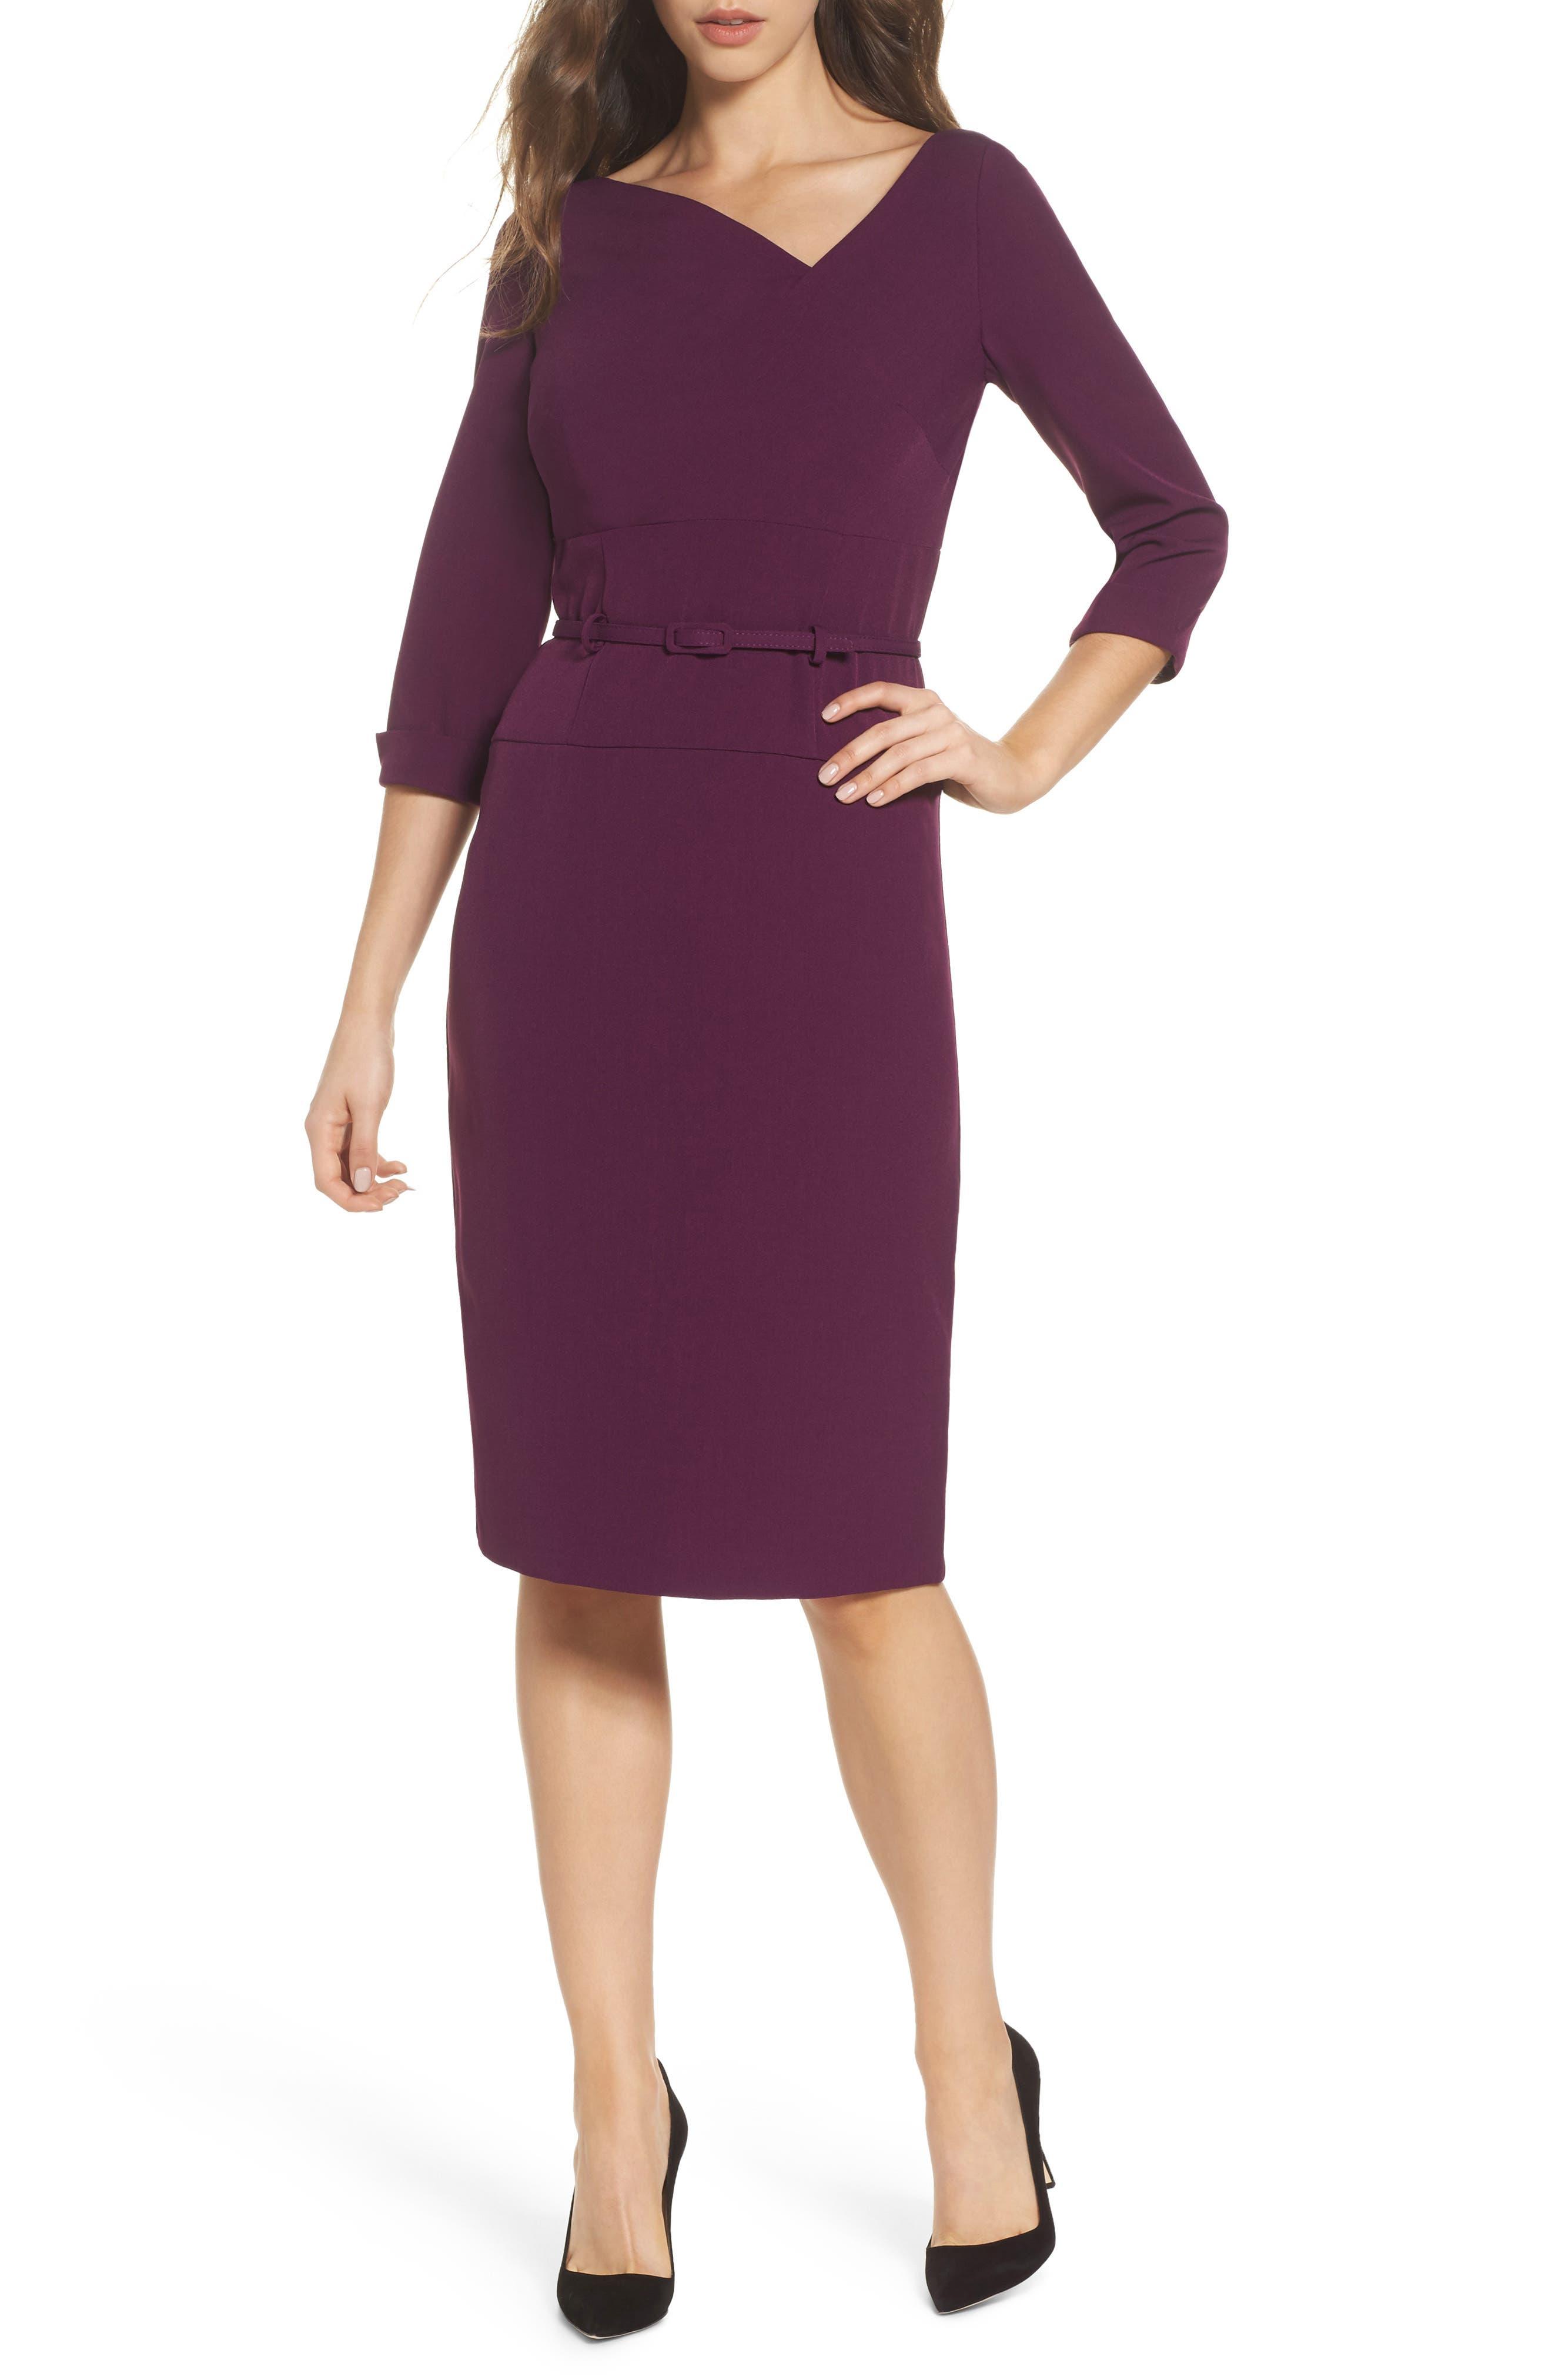 Belted Crepe Sheath Dress,                             Main thumbnail 1, color,                             606